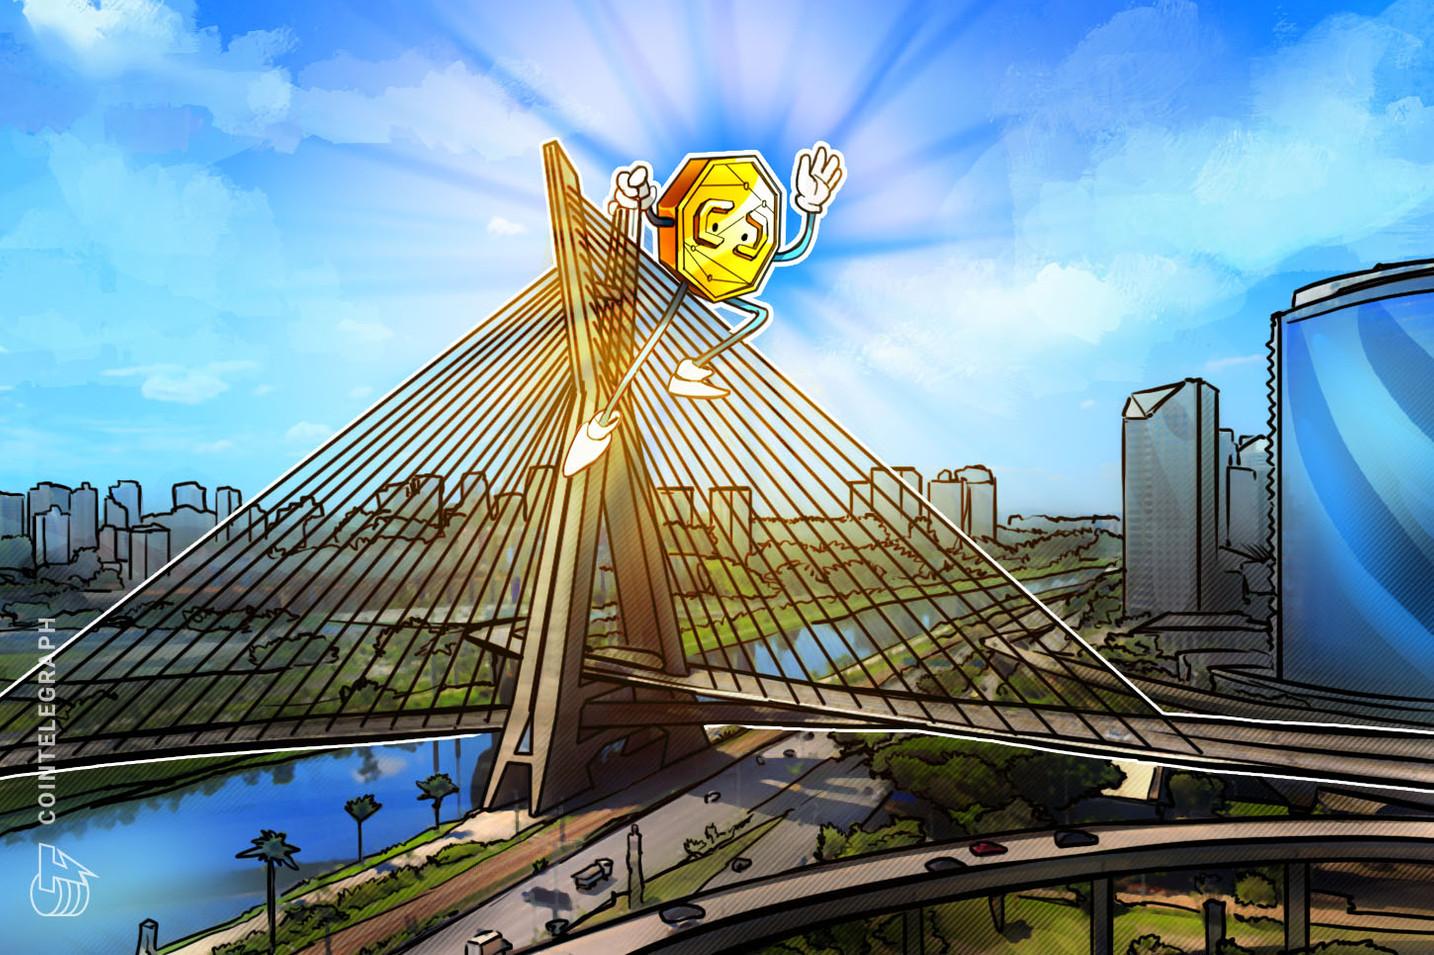 Preço do Bitcoin passa dos R$ 45.000 no Brasil pela primeira vez desde setembro de 2019